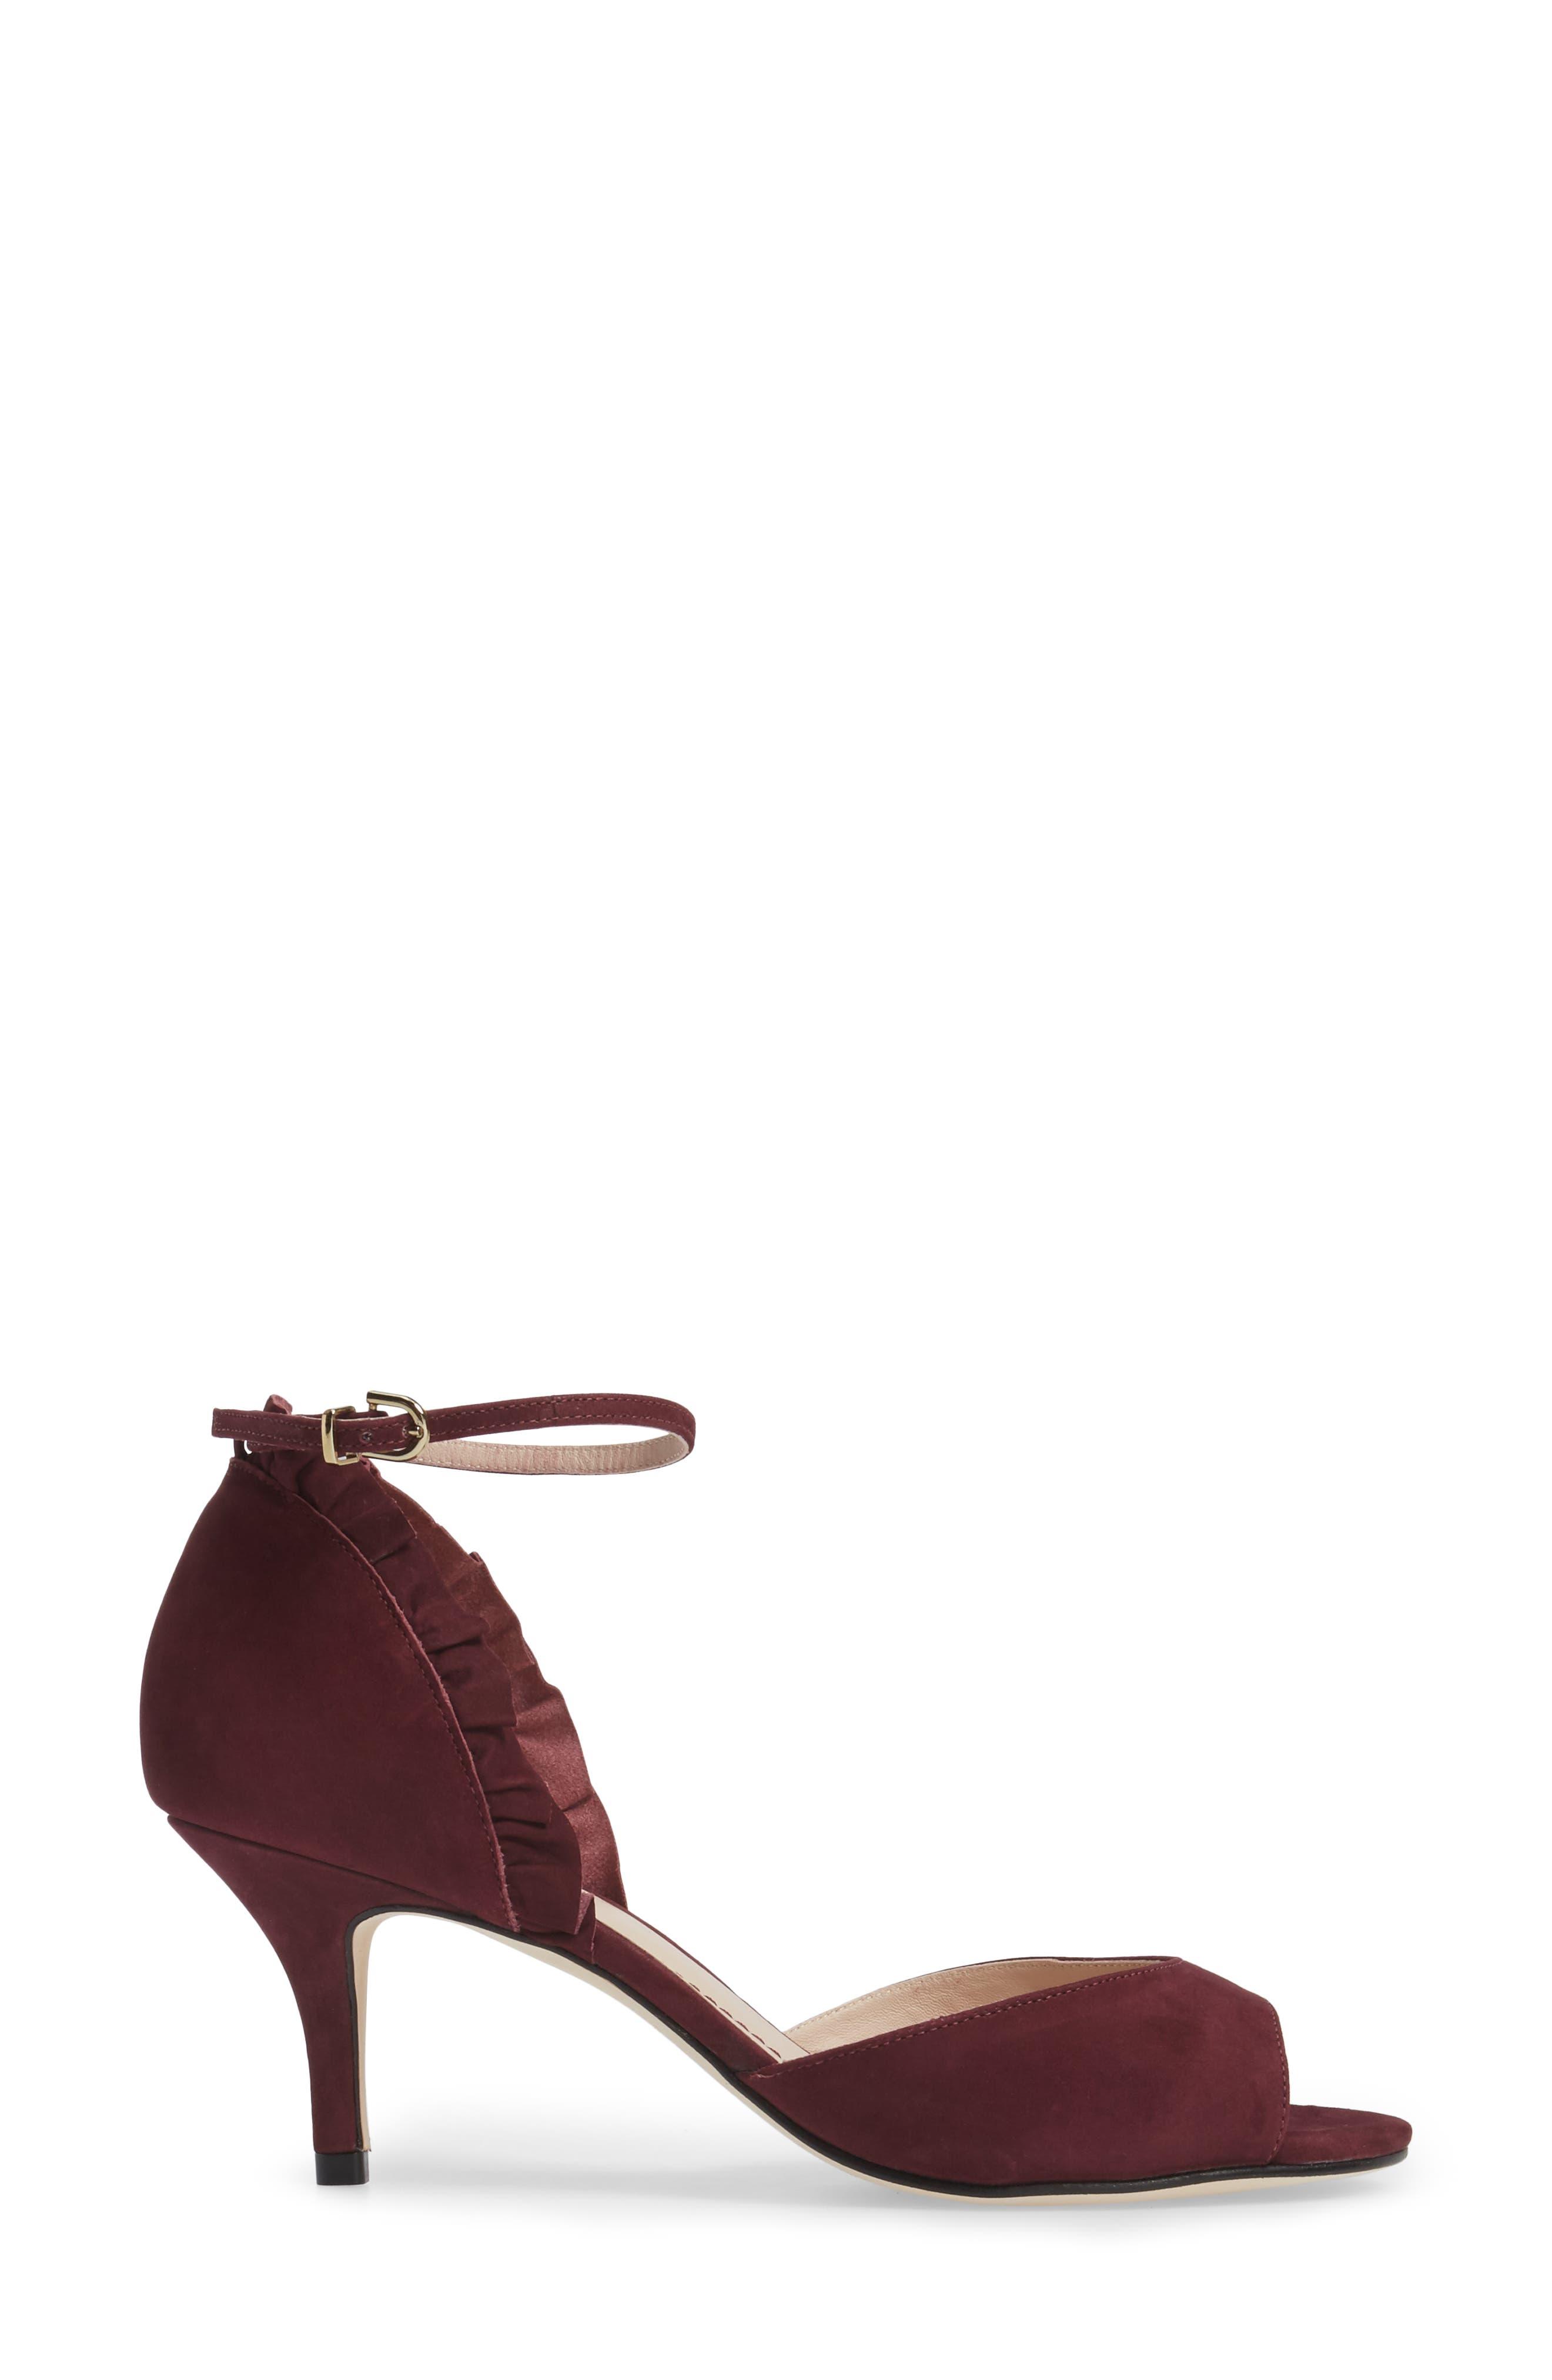 Alisa d'Orsay Sandal,                             Alternate thumbnail 3, color,                             Wine Nubuck Leather